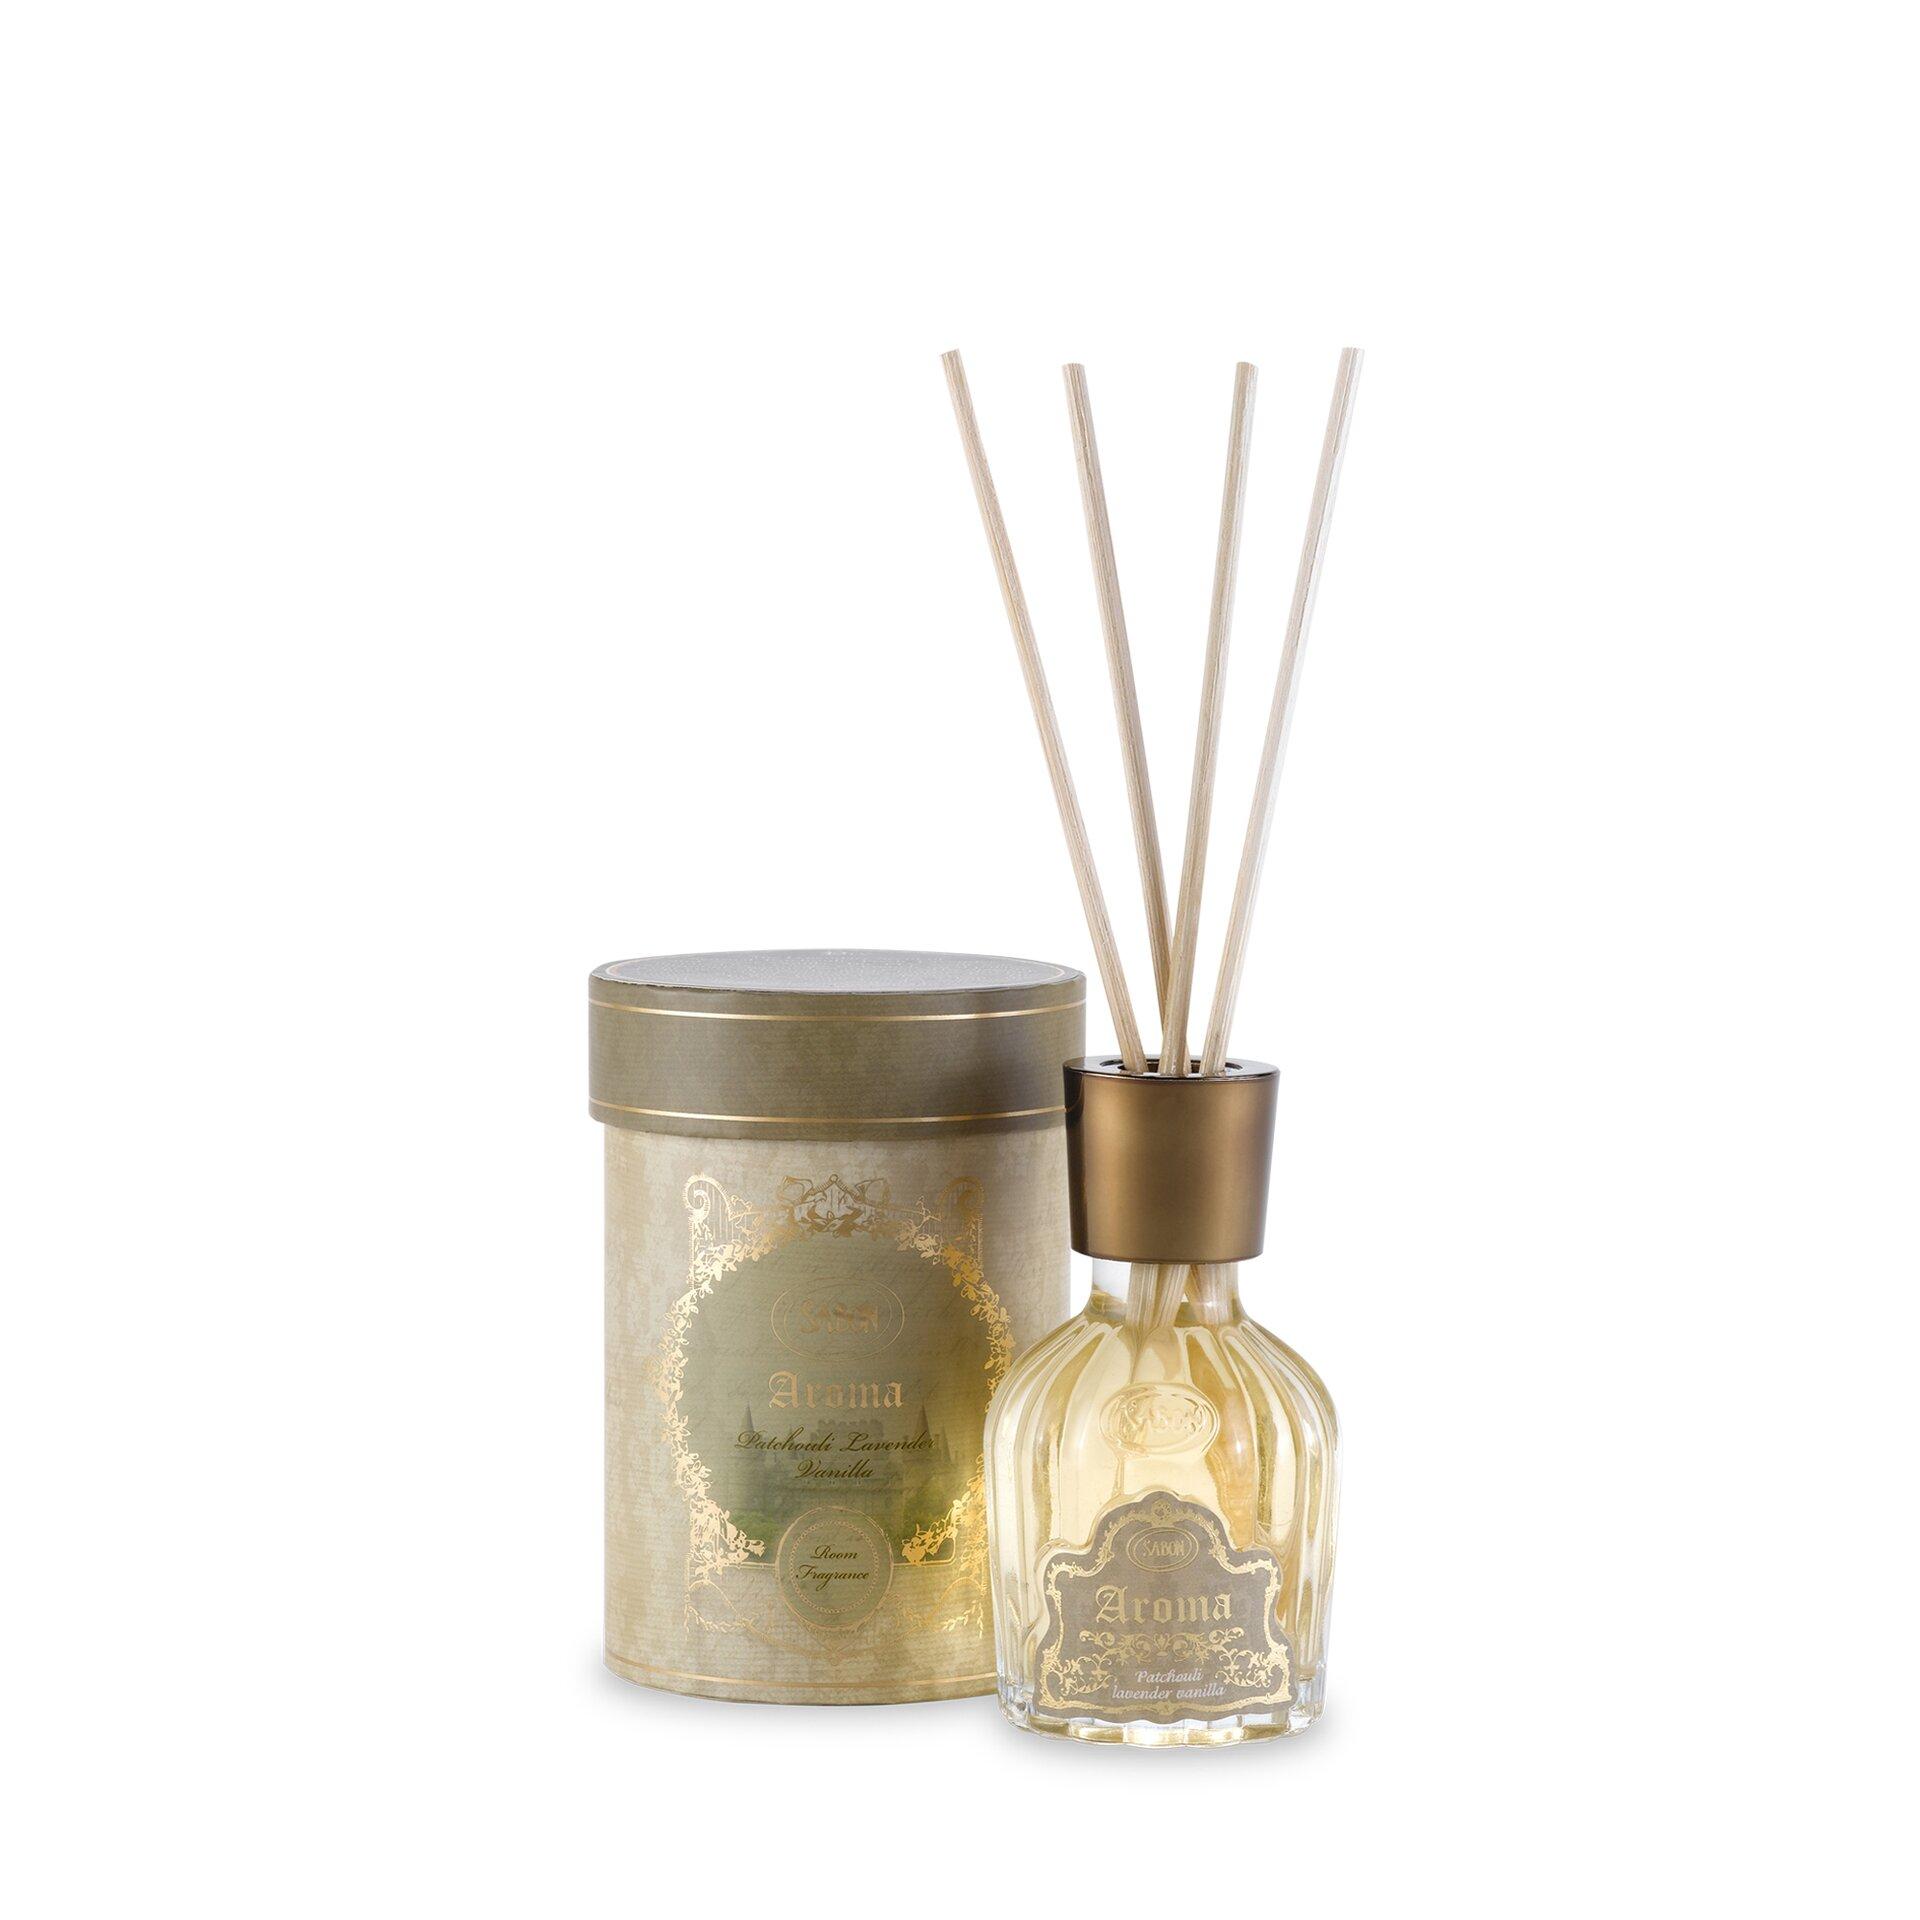 Mini Aromă Royal Paciulie - Lavandă - Vanilie sabon.ro